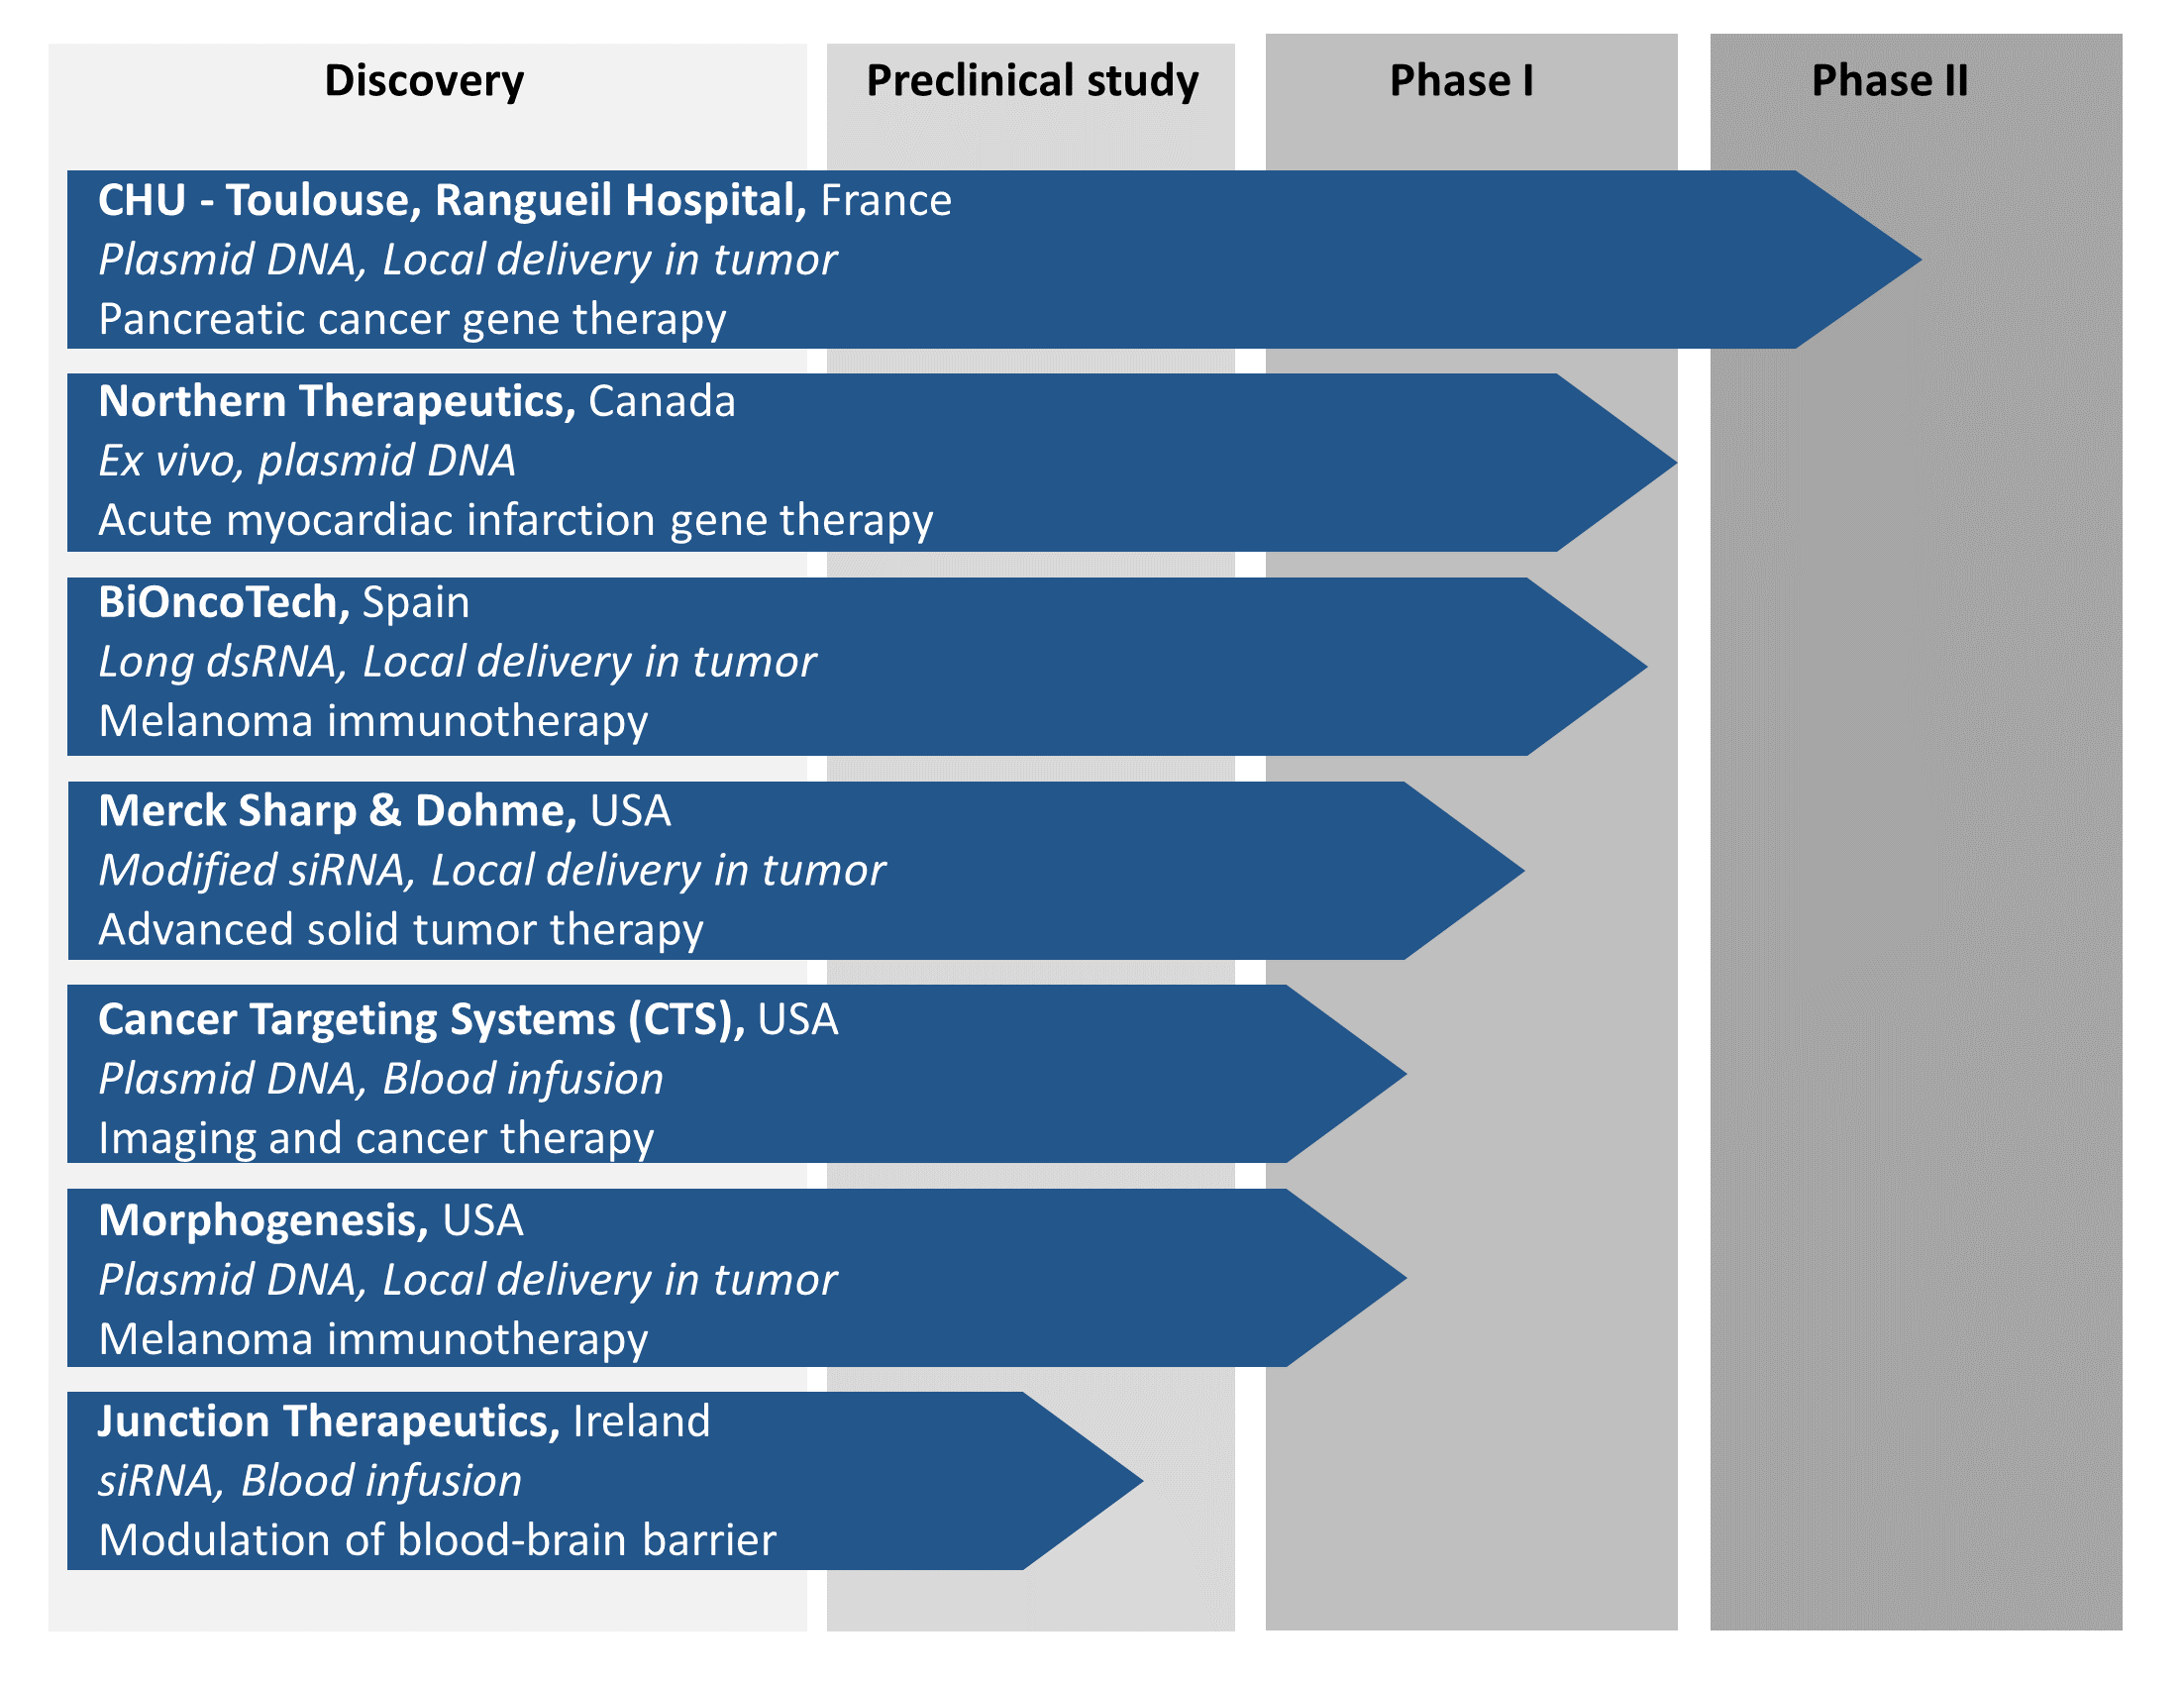 in vivo-jetPEI - Clinical trial pipeline 2020